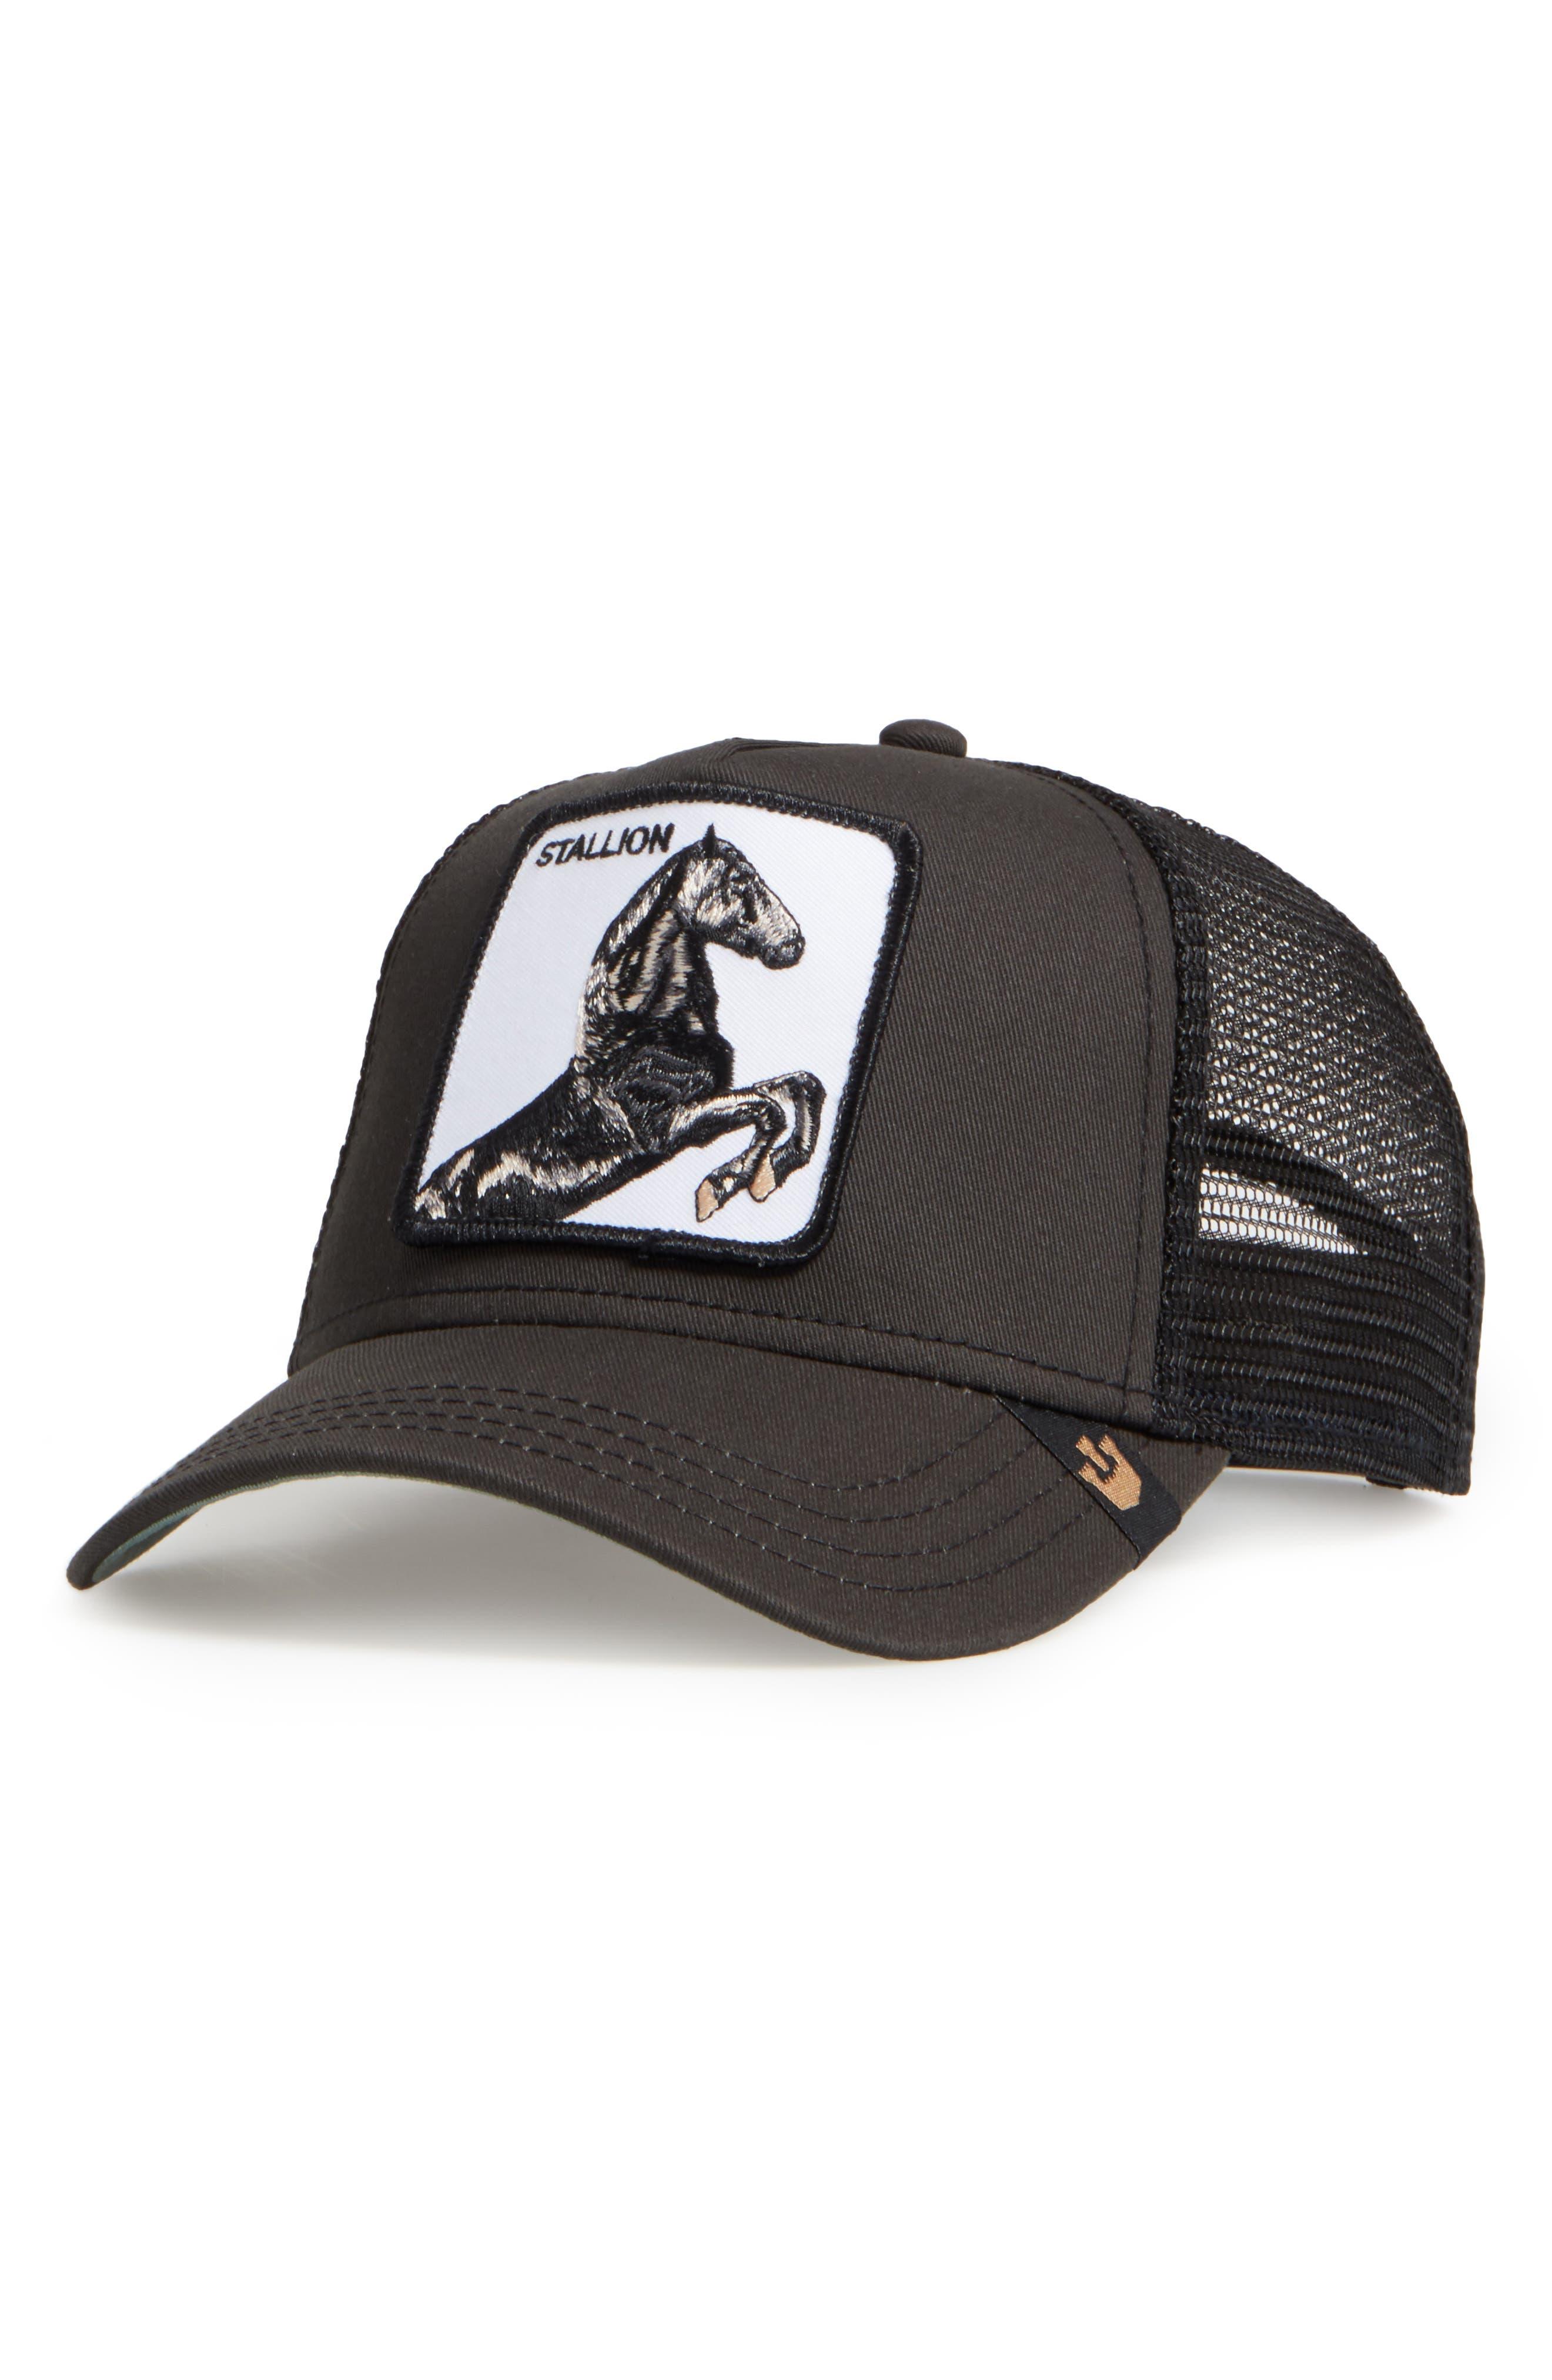 'Stallion' Trucker Hat,                         Main,                         color, 001